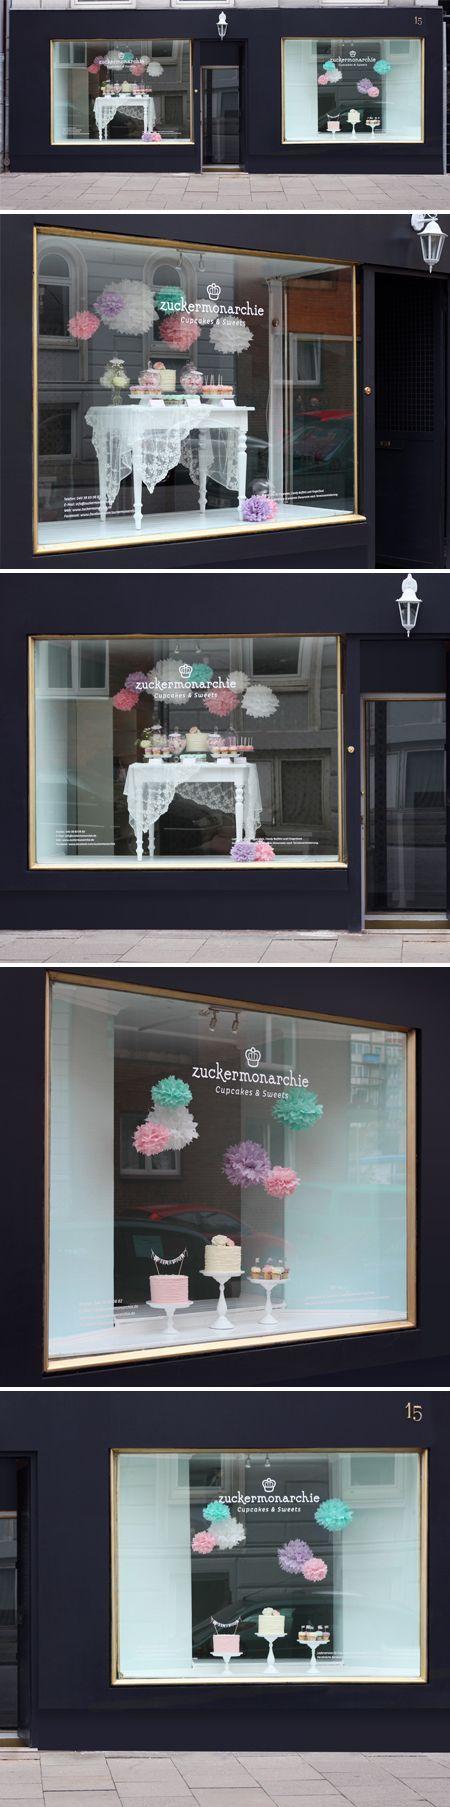 cupcake shop: